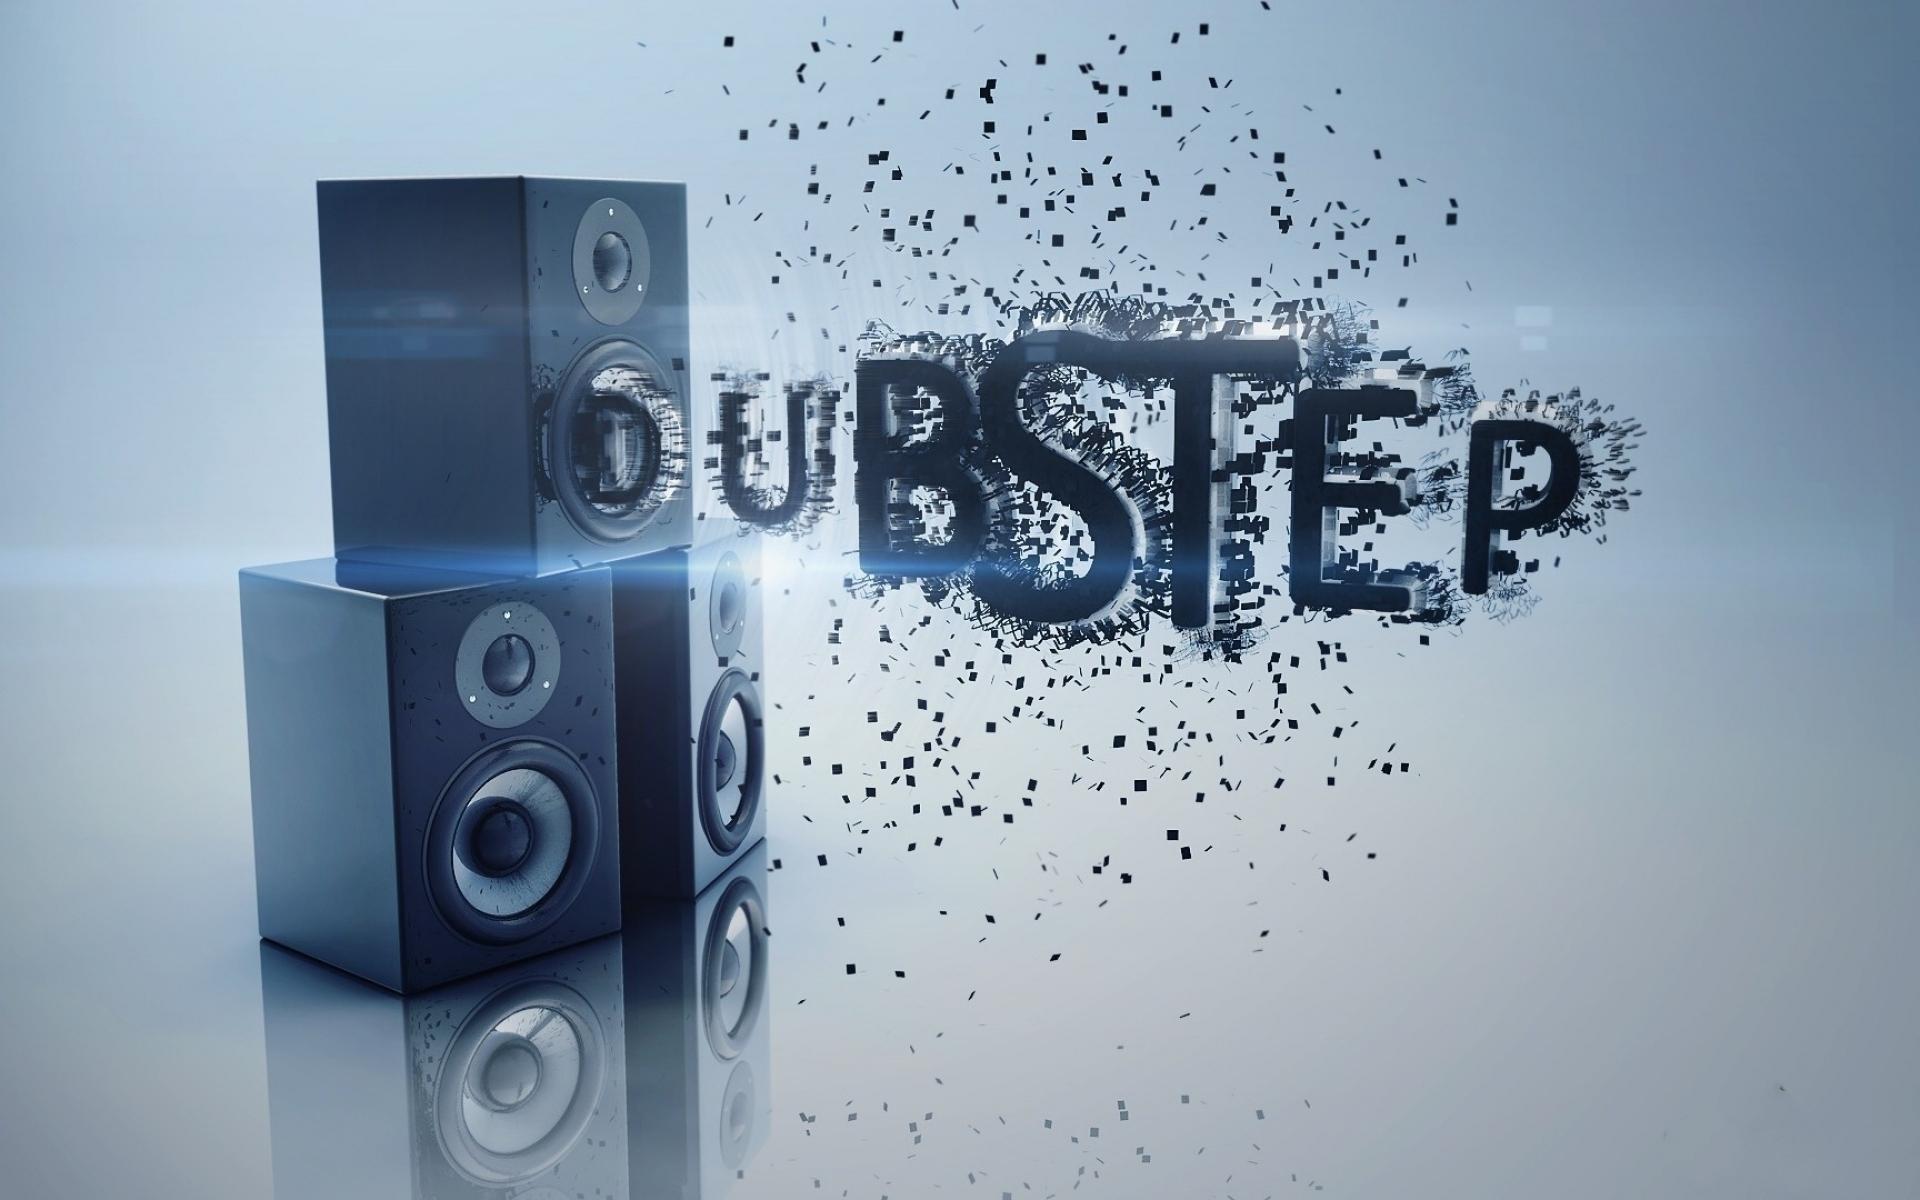 графика dubstep музыка  № 2880876 бесплатно